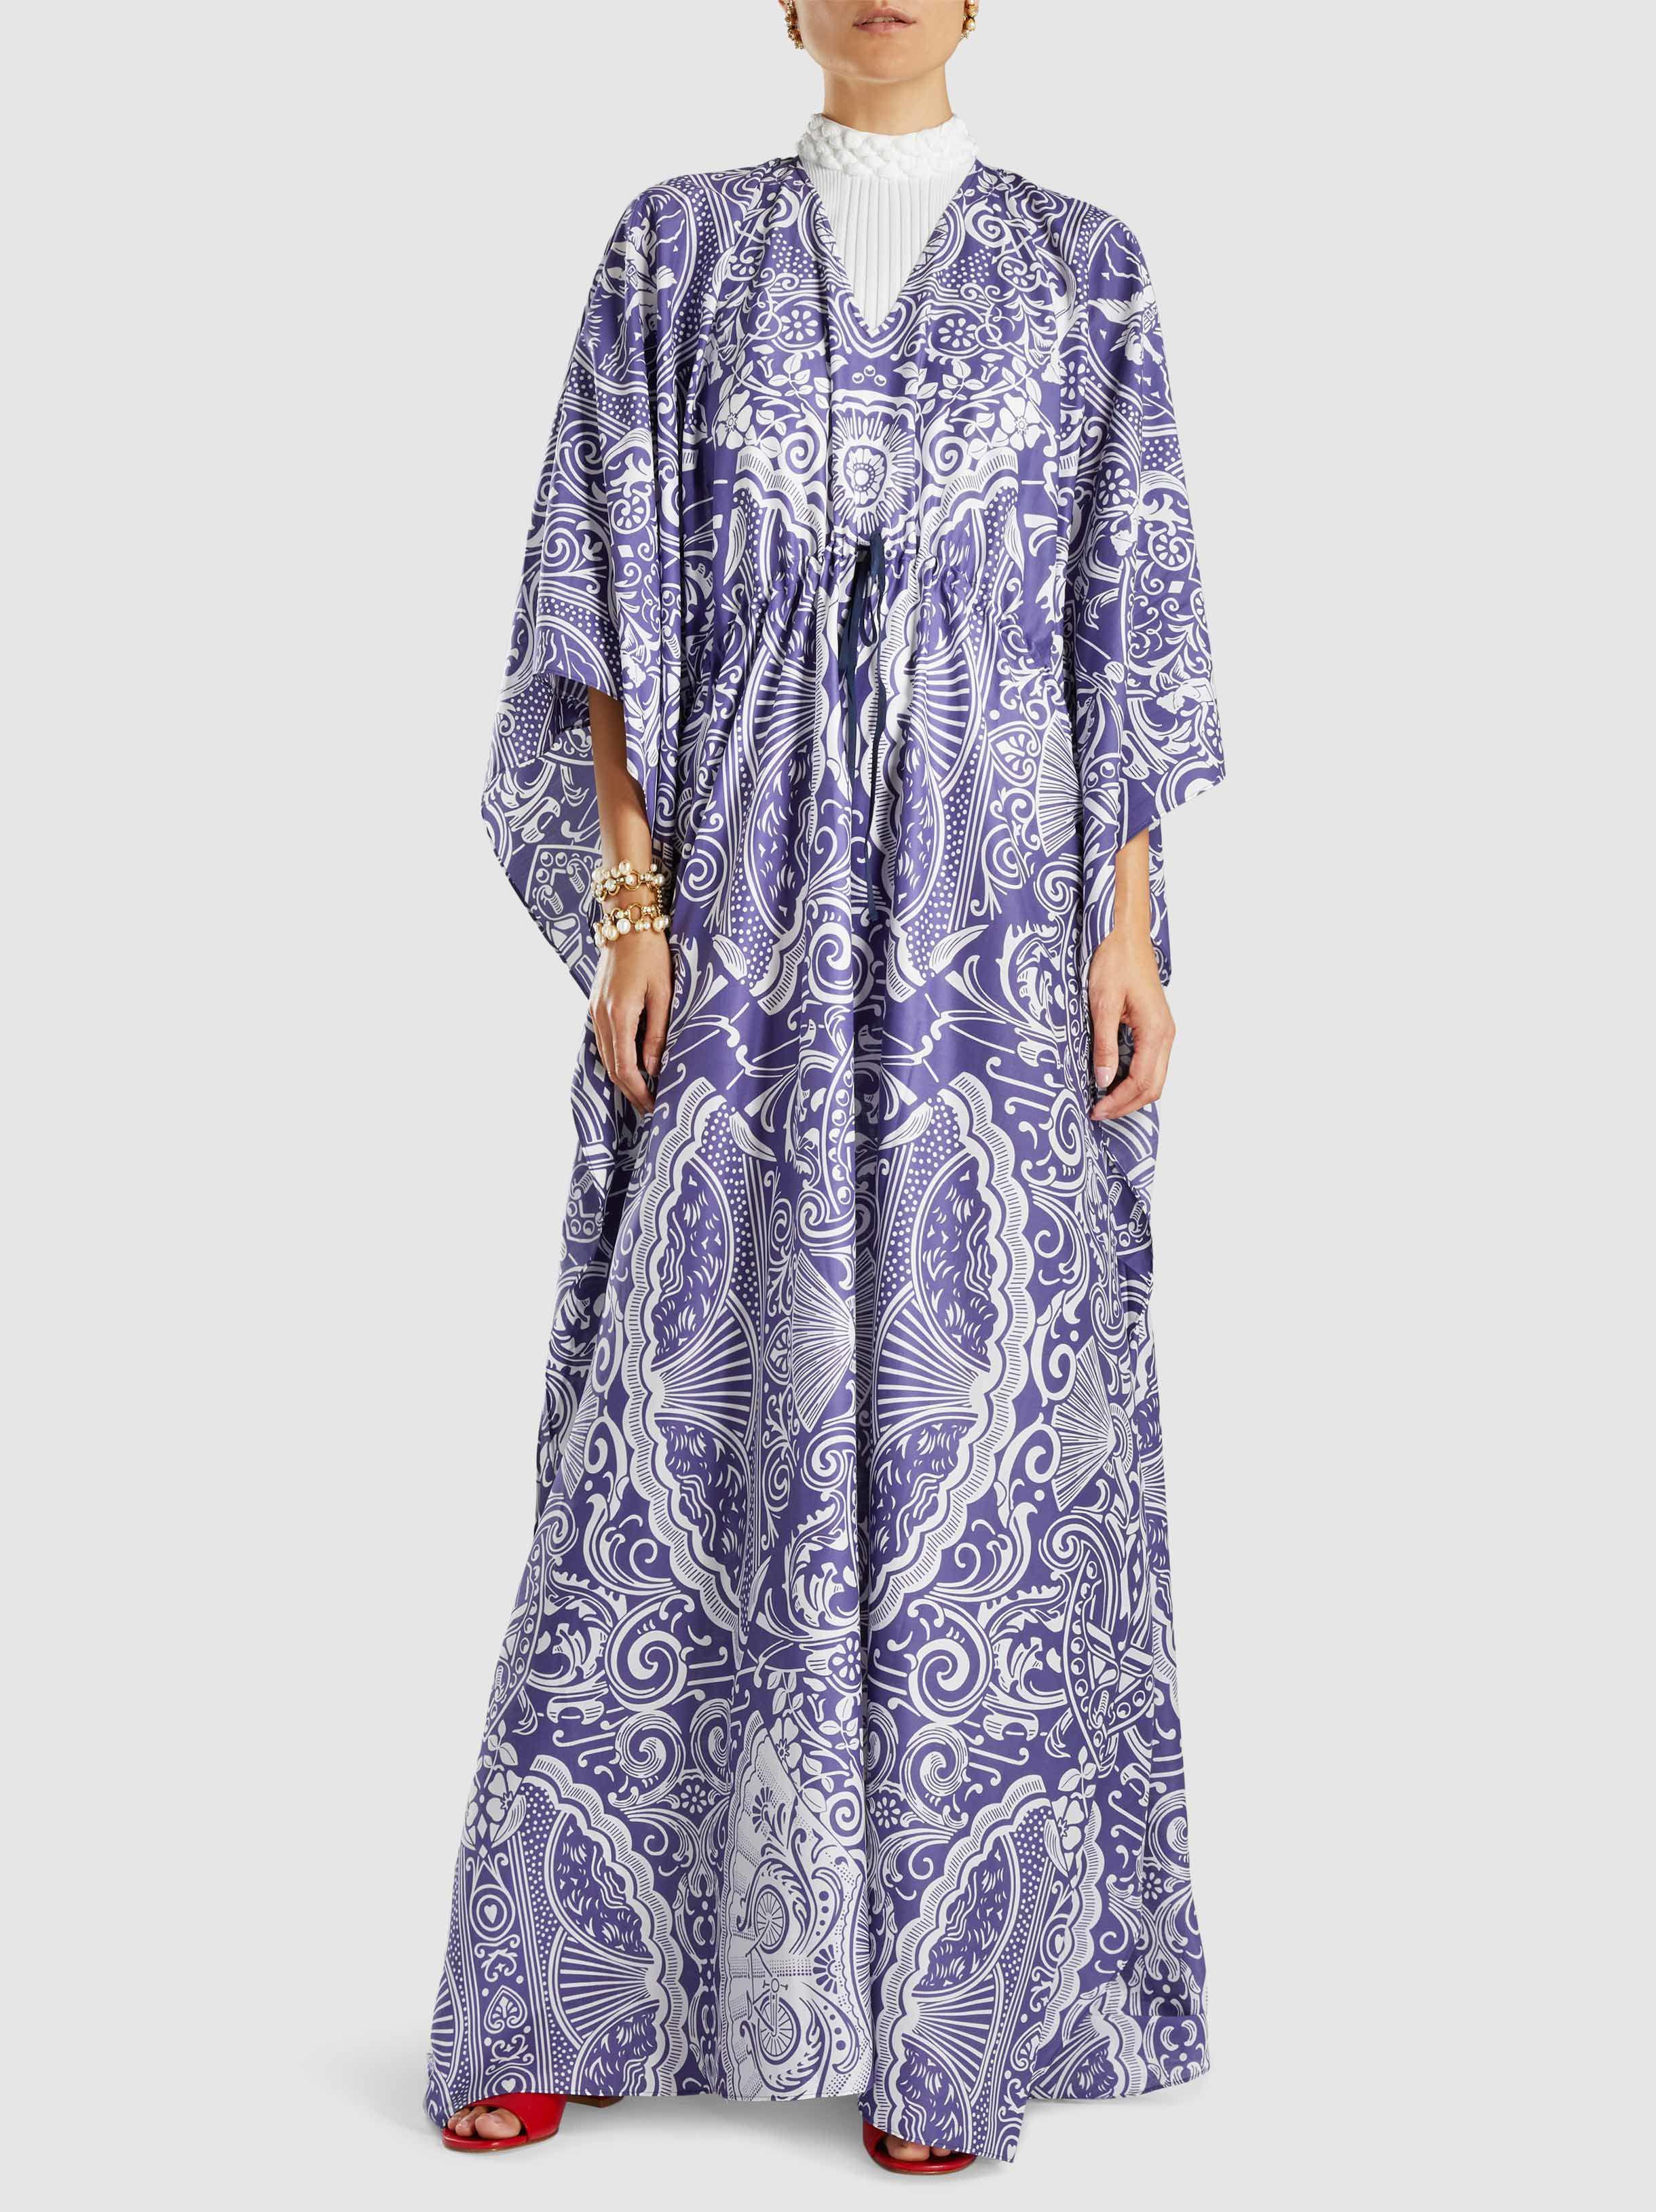 Buy Cheap Shop For Printed Cotton-Blend Kaftan Gown Mary Katrantzou Clearance Geniue Stockist Genuine Il0felMQ8g